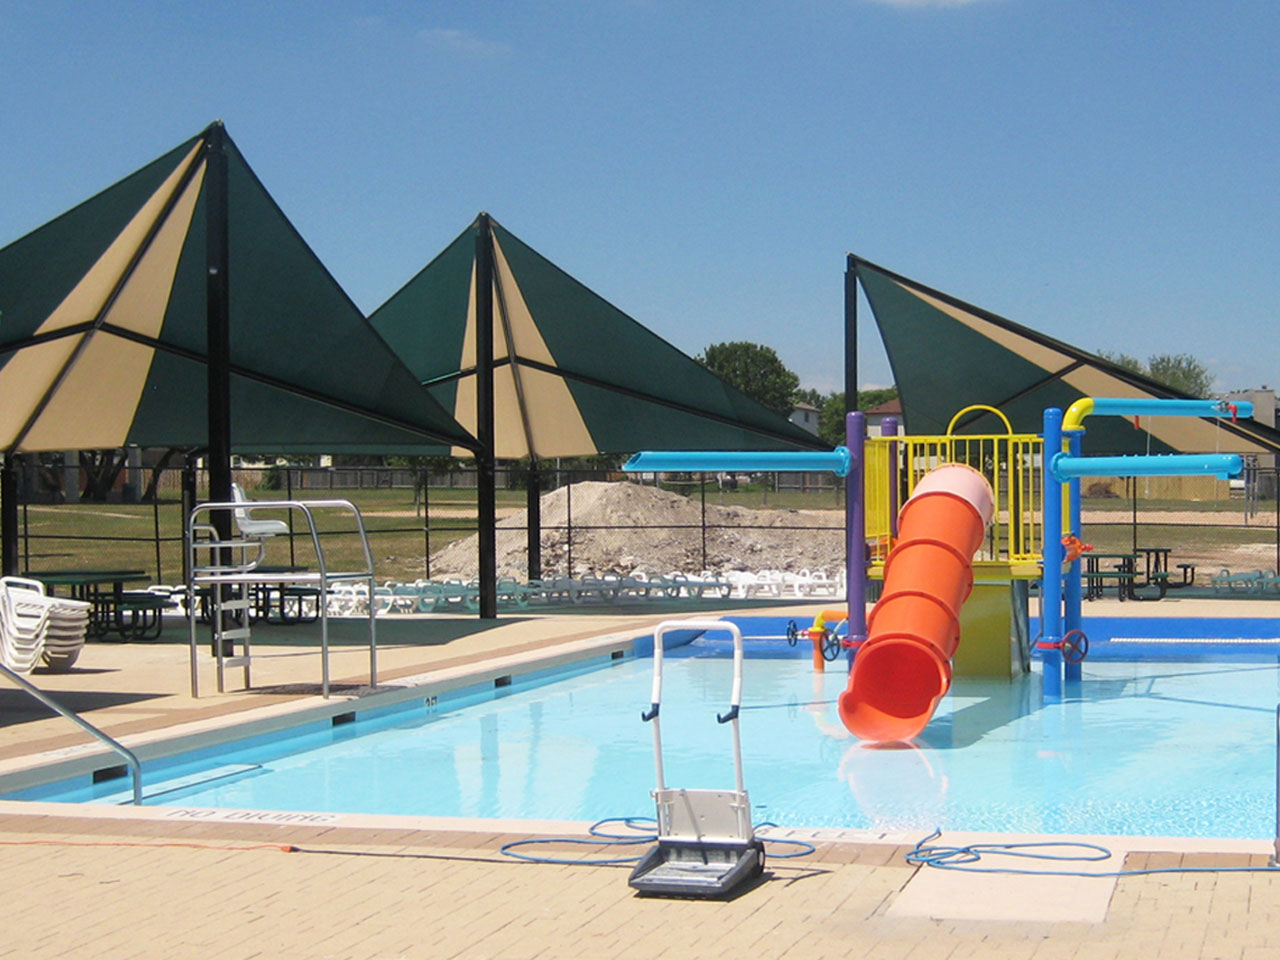 Projects Laurelwood Hoa Pool Usa Shade